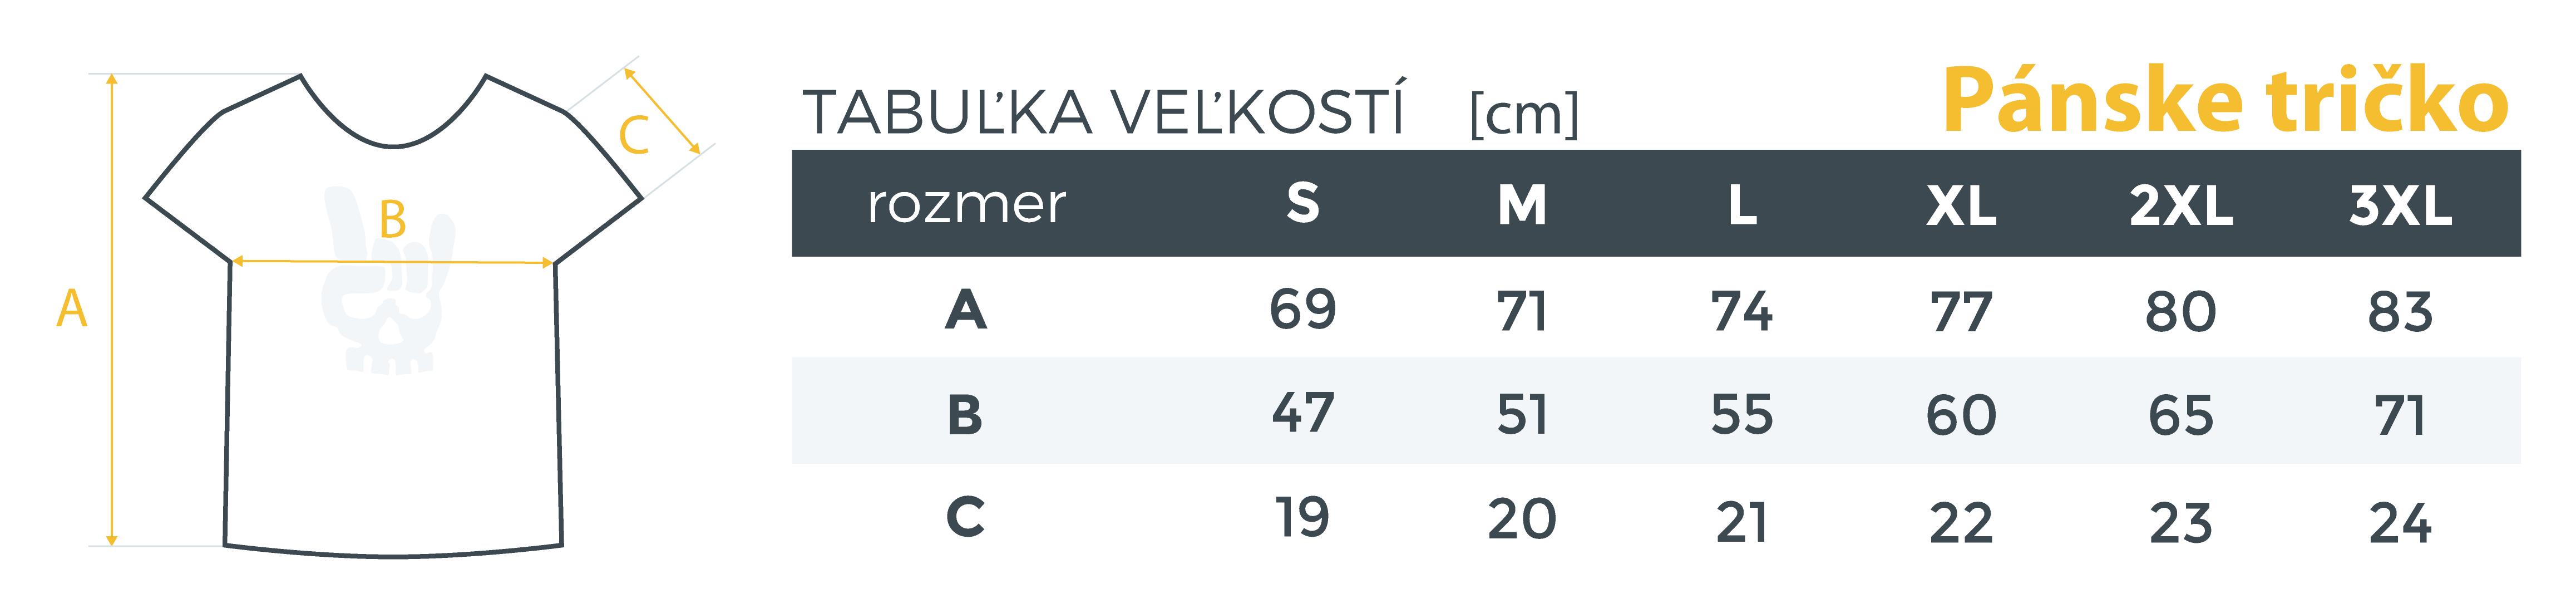 tabulka-velkosti-panske-tricko-motosopa-hbc-app